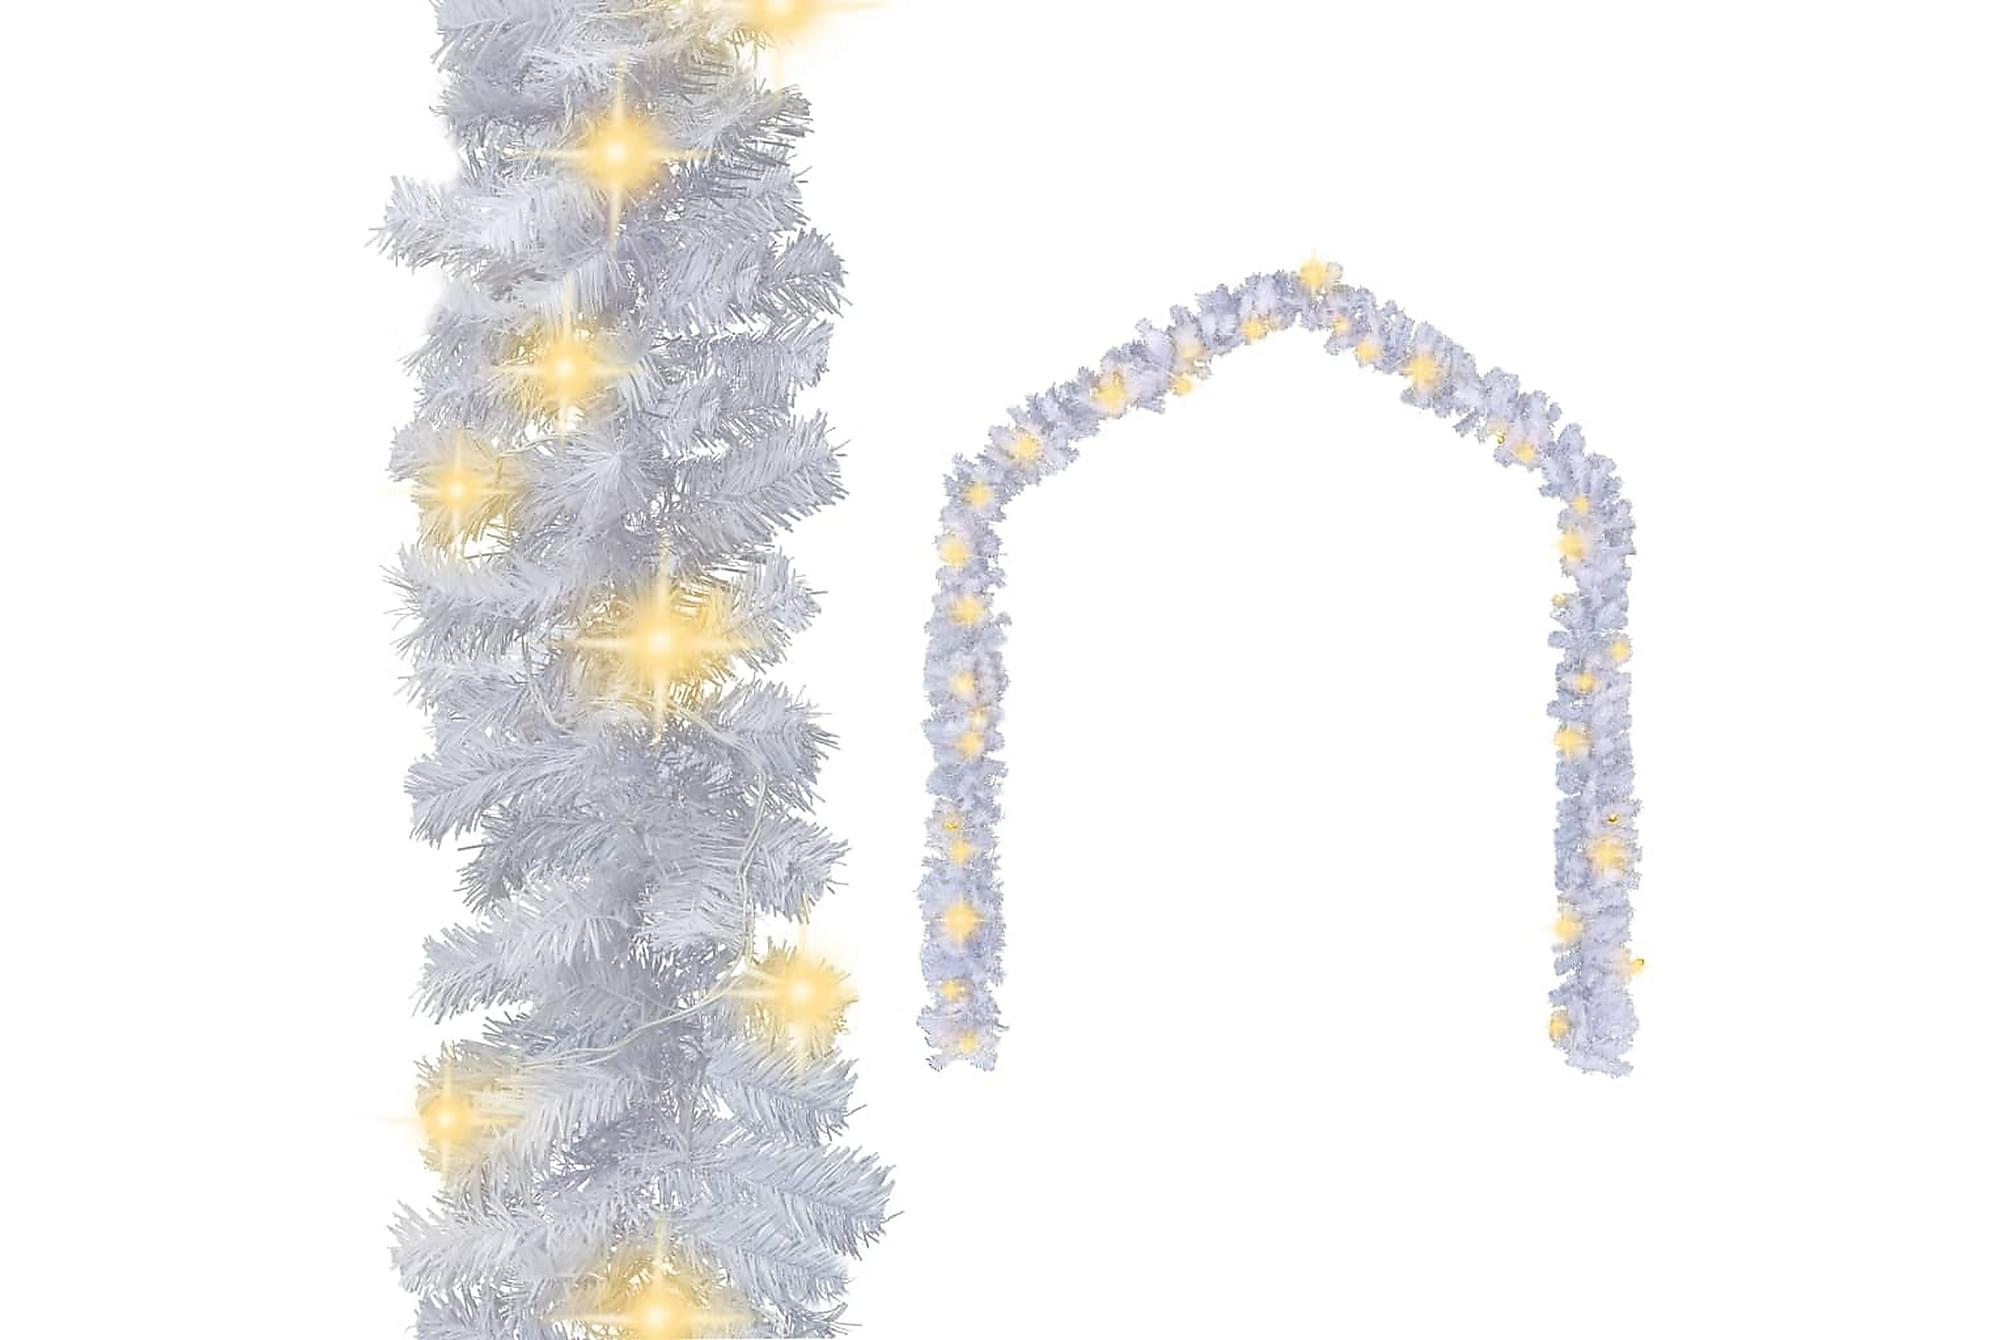 Julgirlang med LED-lampor 10 m vit, Julpynt & juldekoration